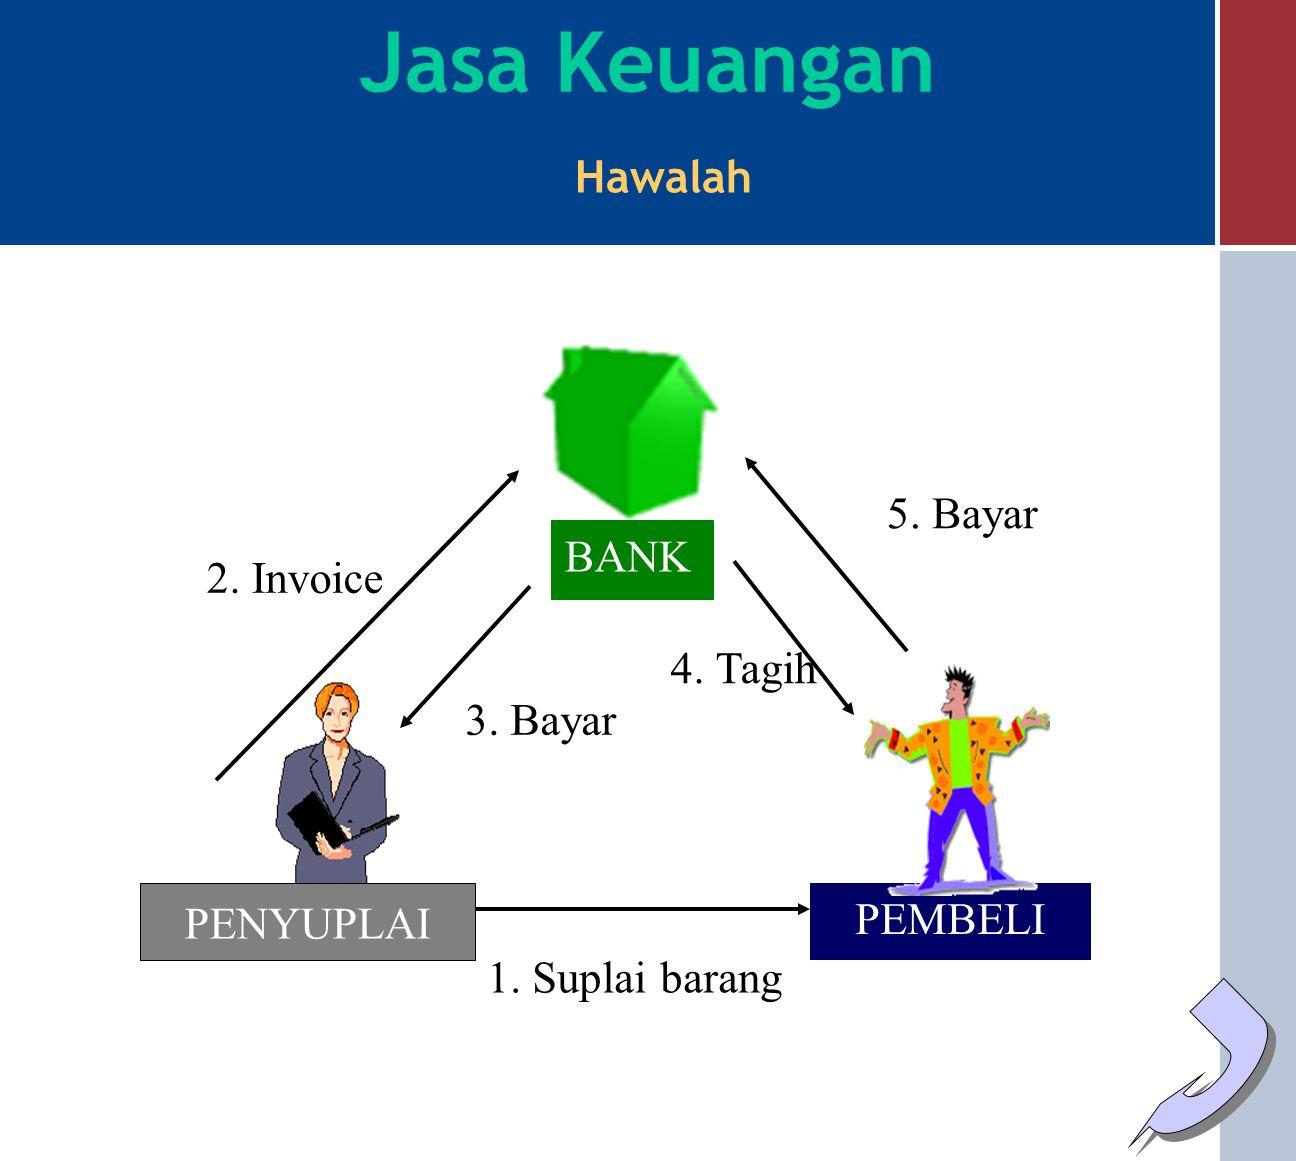 BANK NASABAH Penanggung Ditanggung Tertanggung Jasa Objek Jasa Keuangan Kafalah